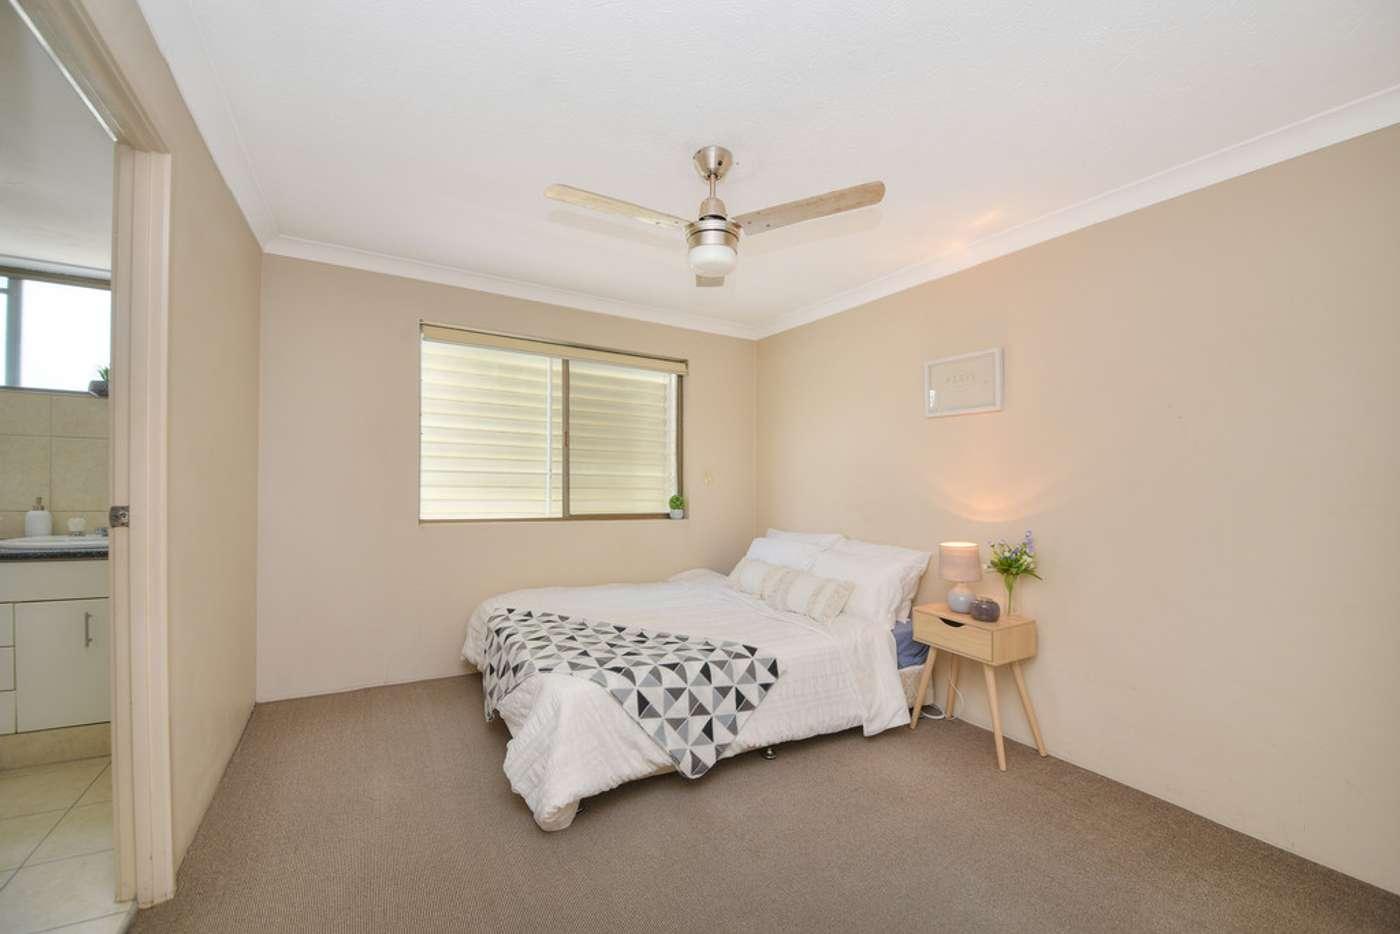 Seventh view of Homely apartment listing, 5/26 Albatross Avenue, Mermaid Beach QLD 4218